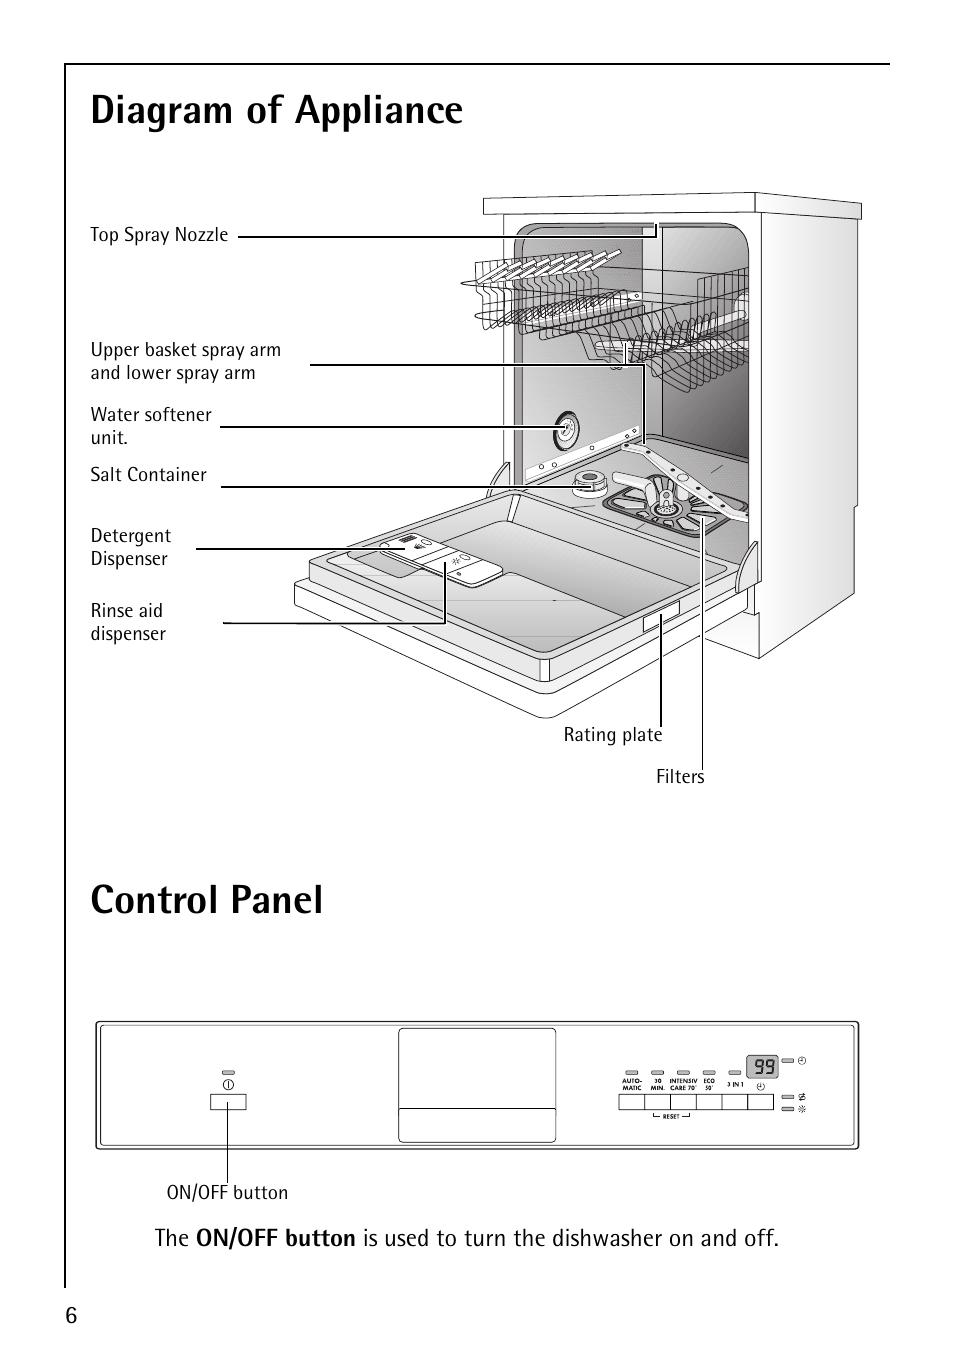 diagram of appliance control panel aeg favorit 40850 user manual rh manualsdir com